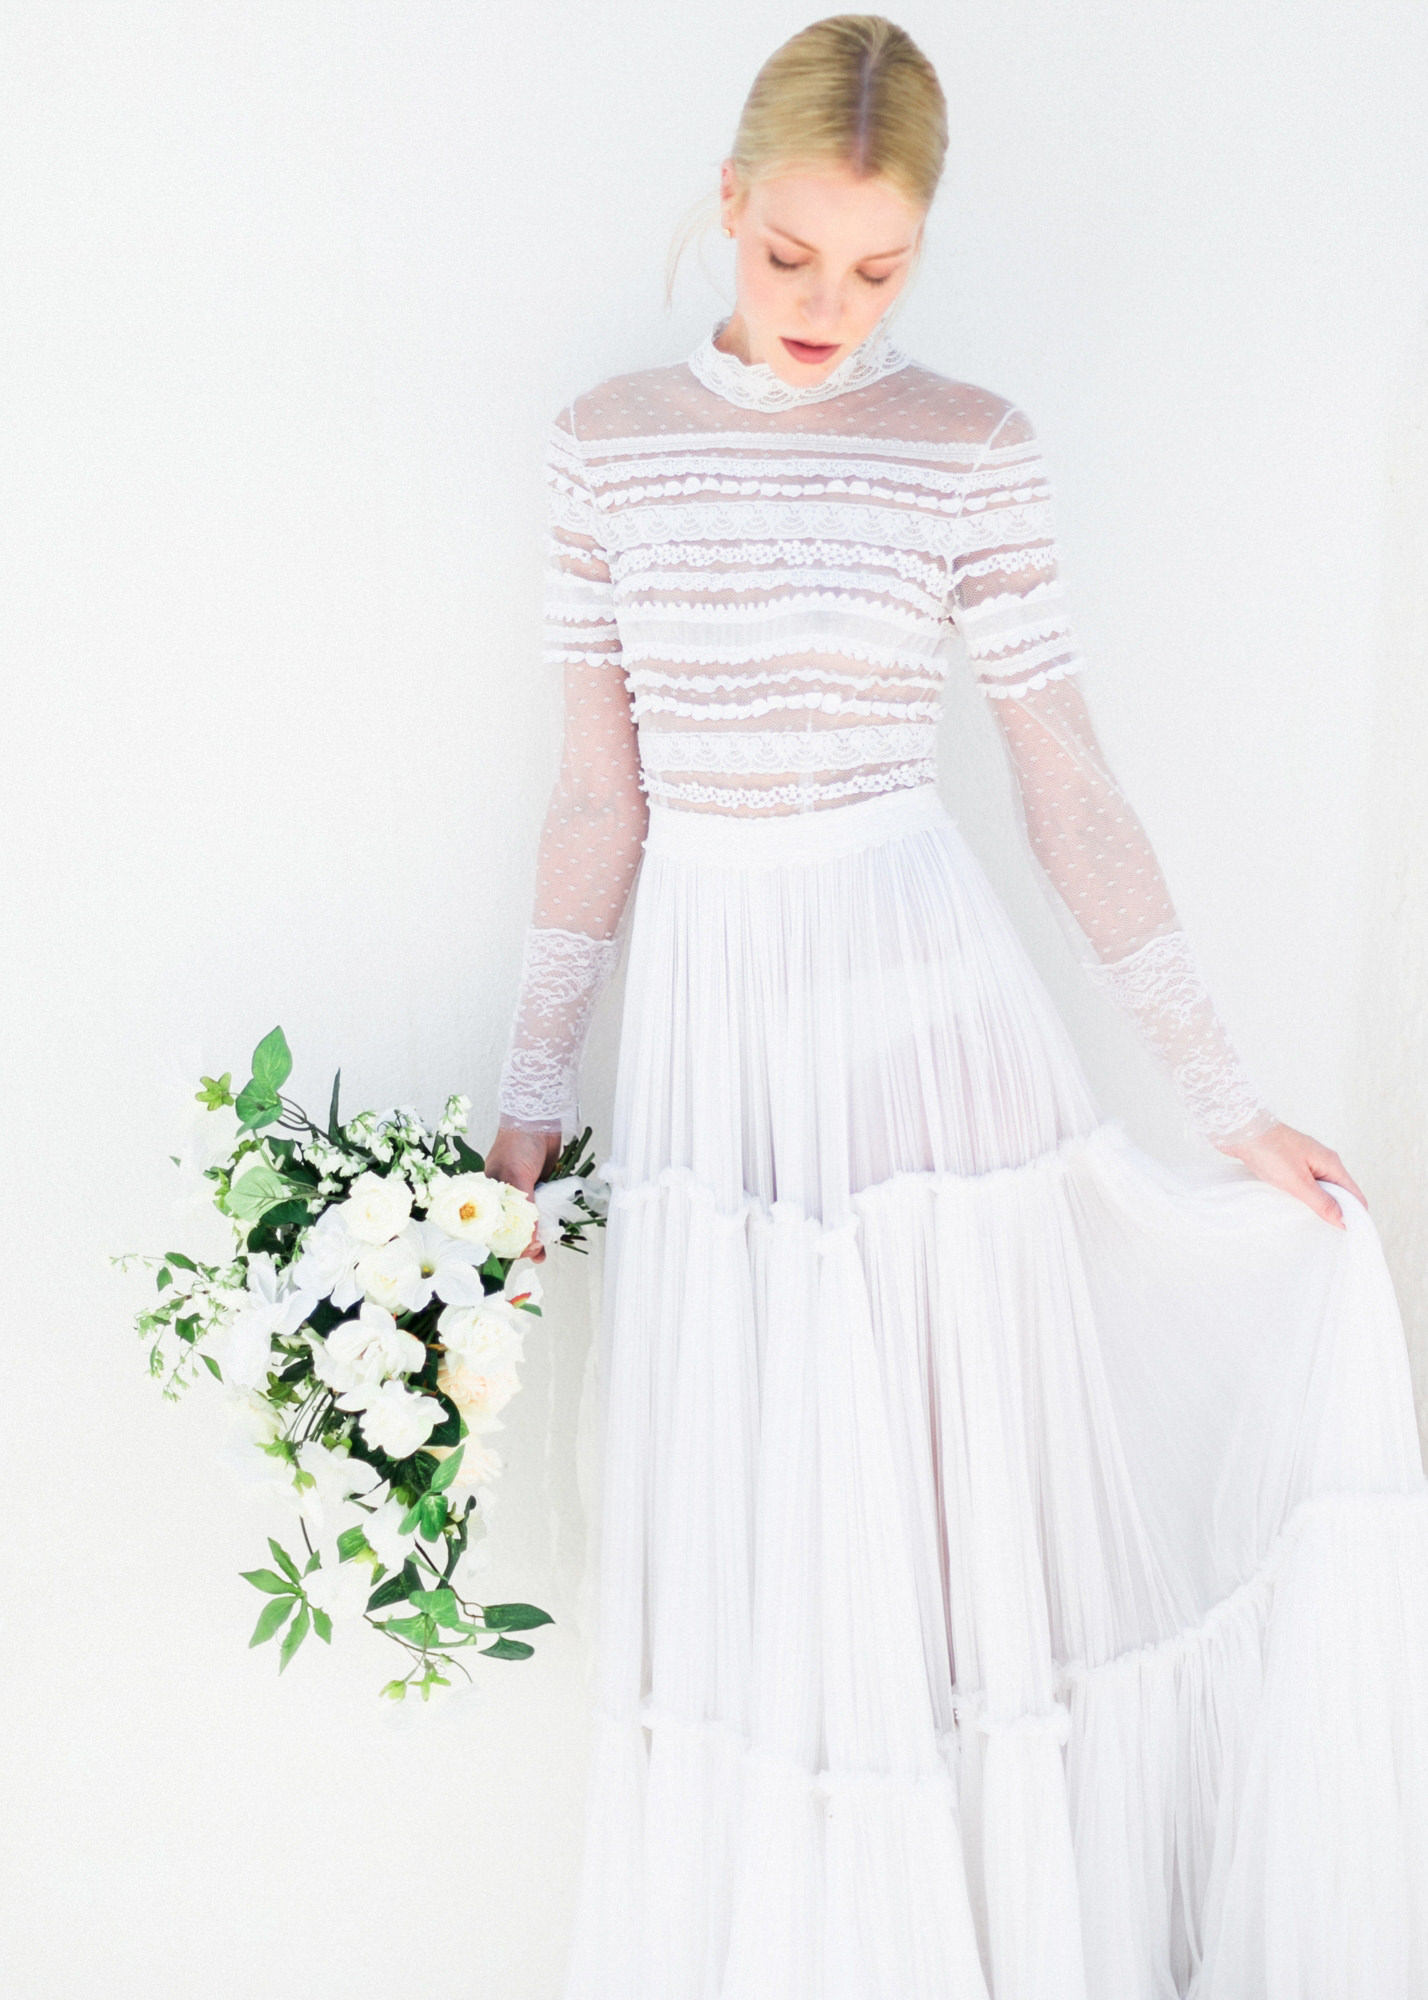 05-portrait-santorini-wedding-photographer-greece-b-v